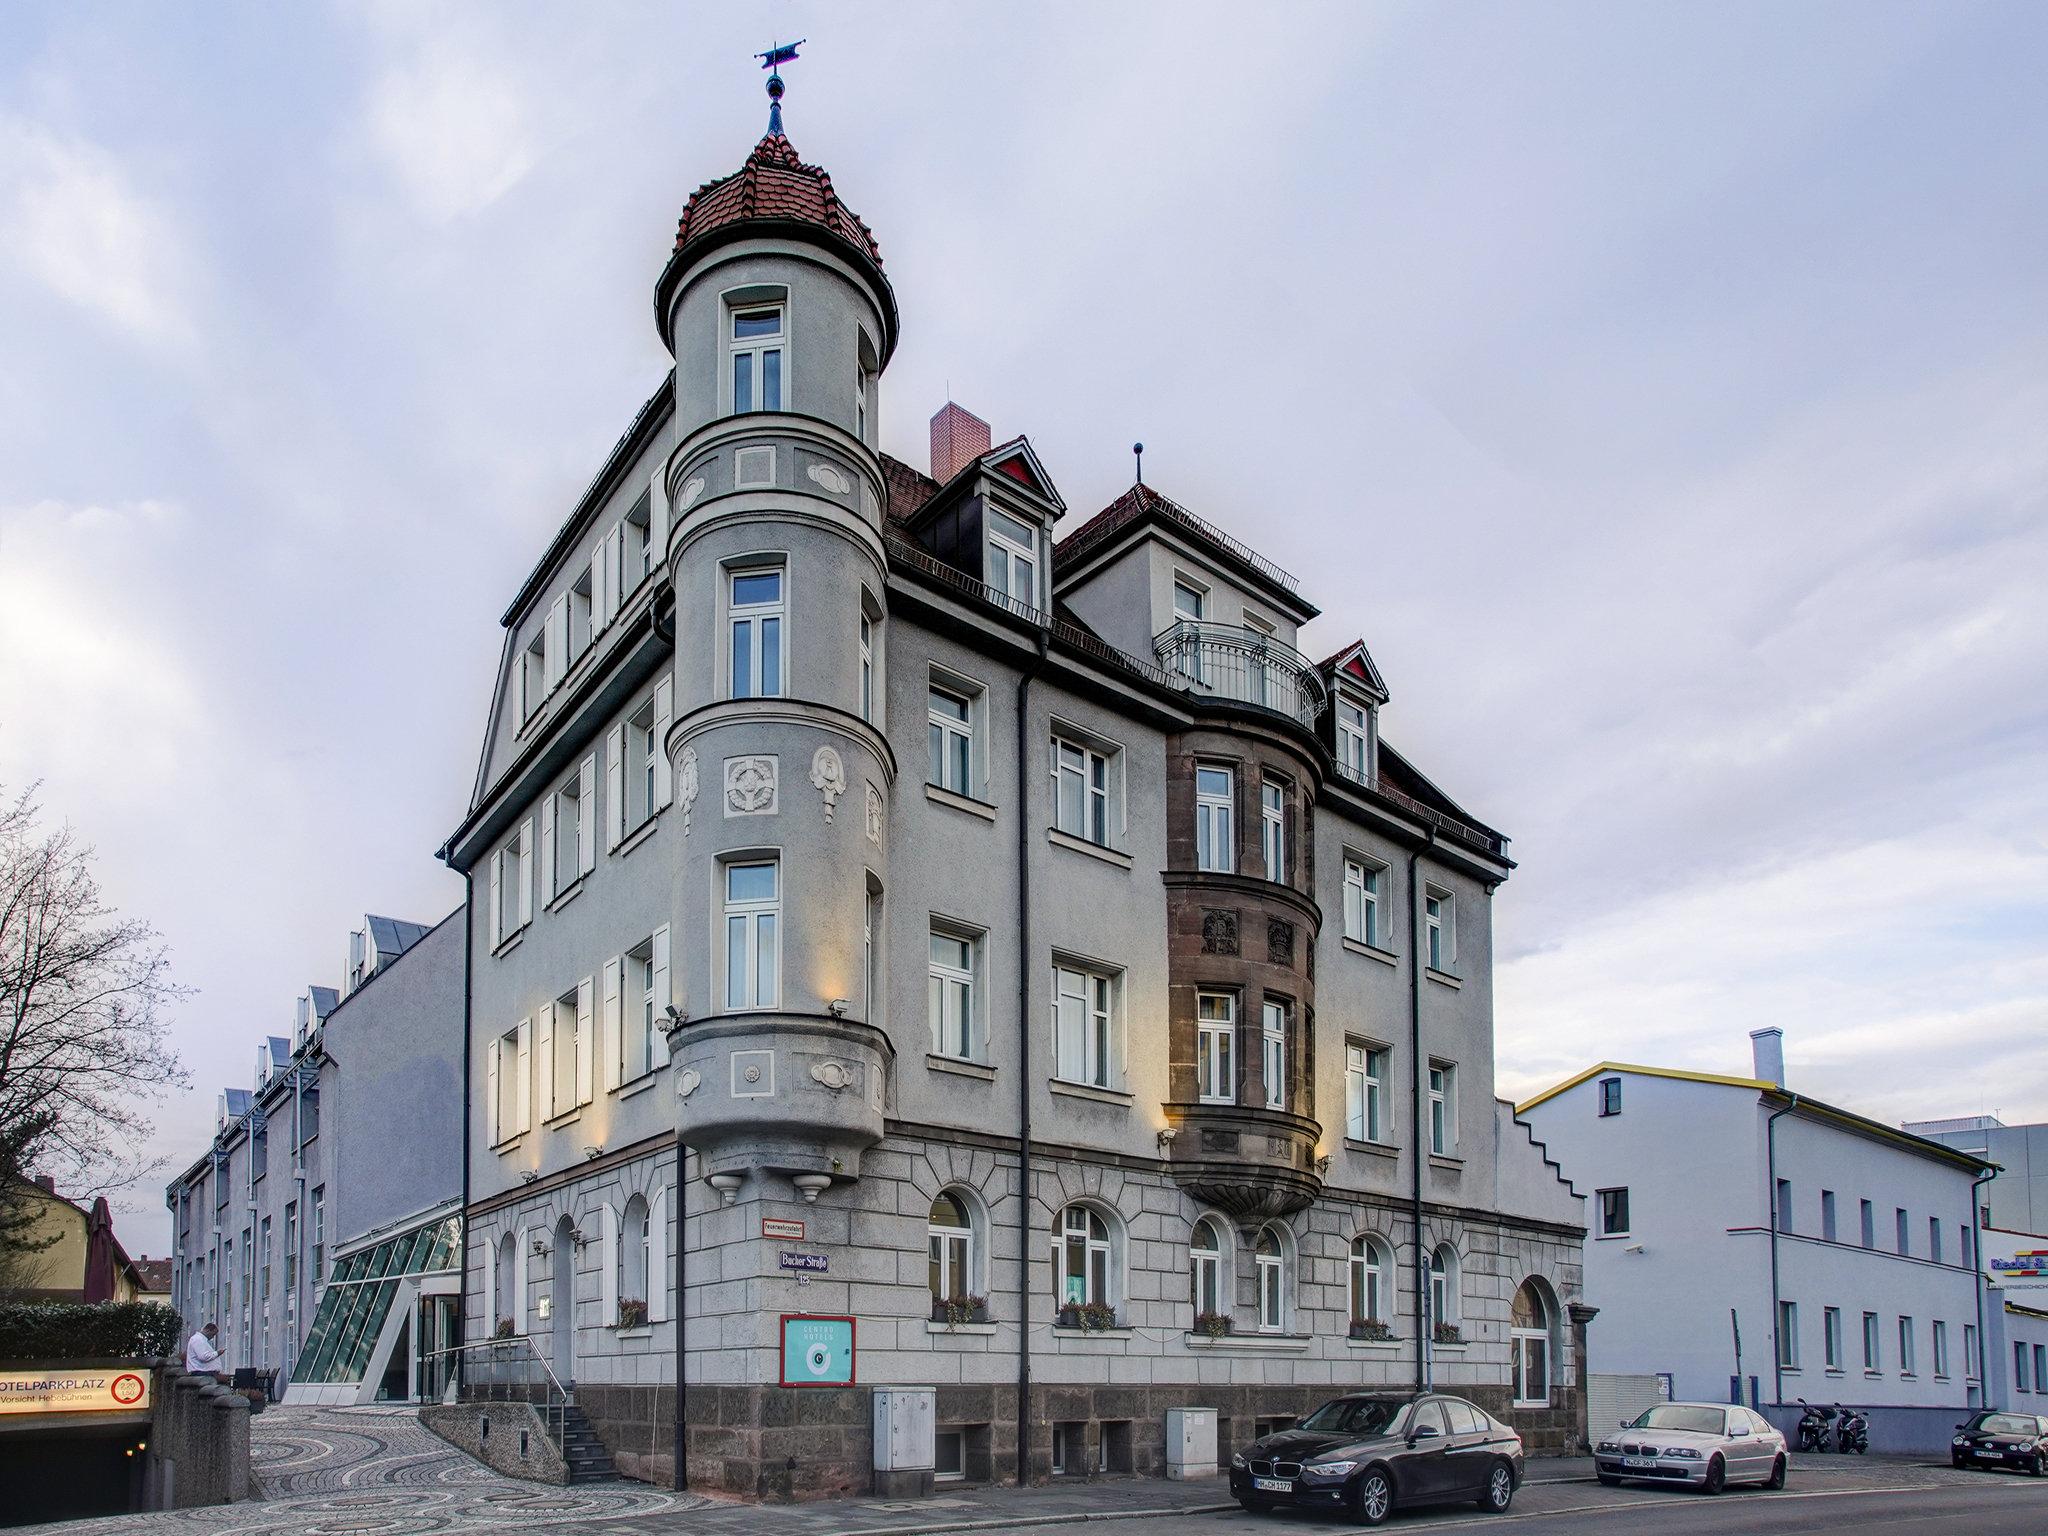 Hotel Nurnberg Top Hotels Gunstig Bei Hrs Buchen